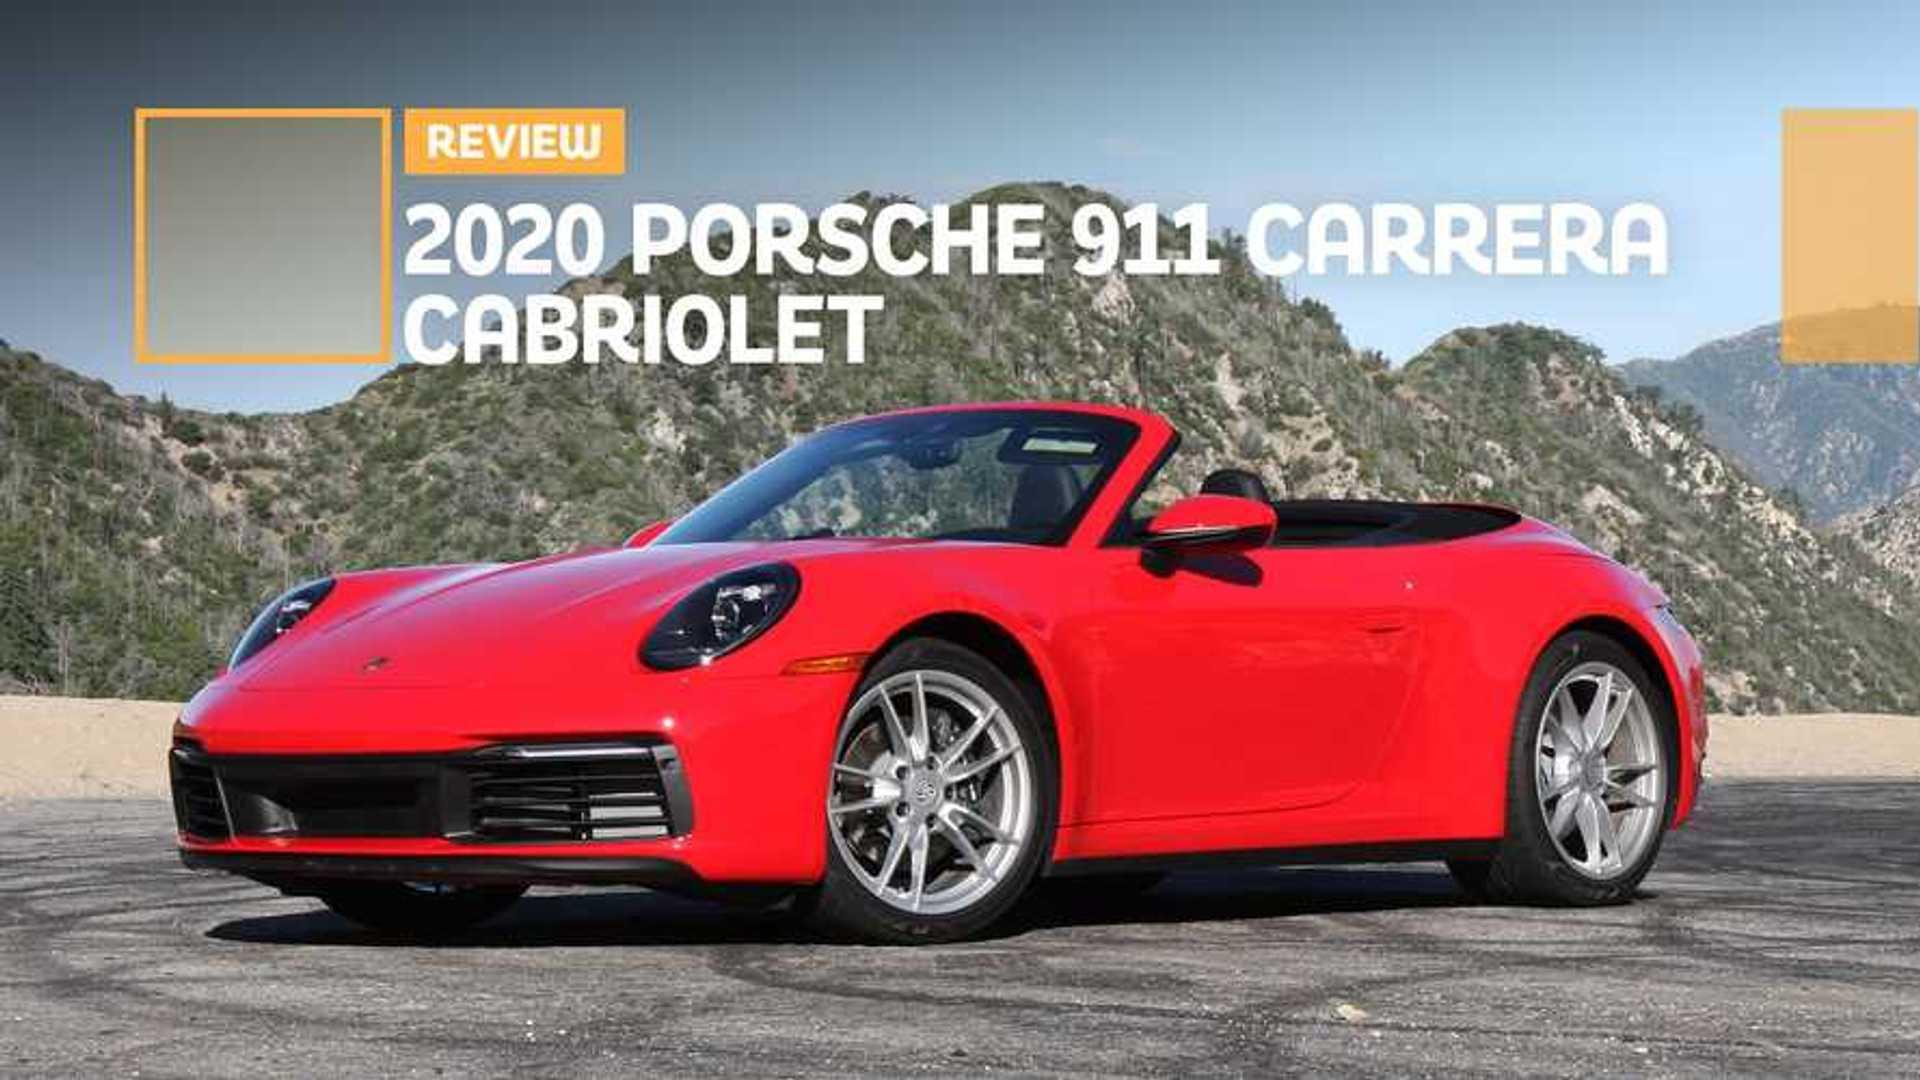 2020 Porsche 911 Carrera Cabriolet Base Model Beauty